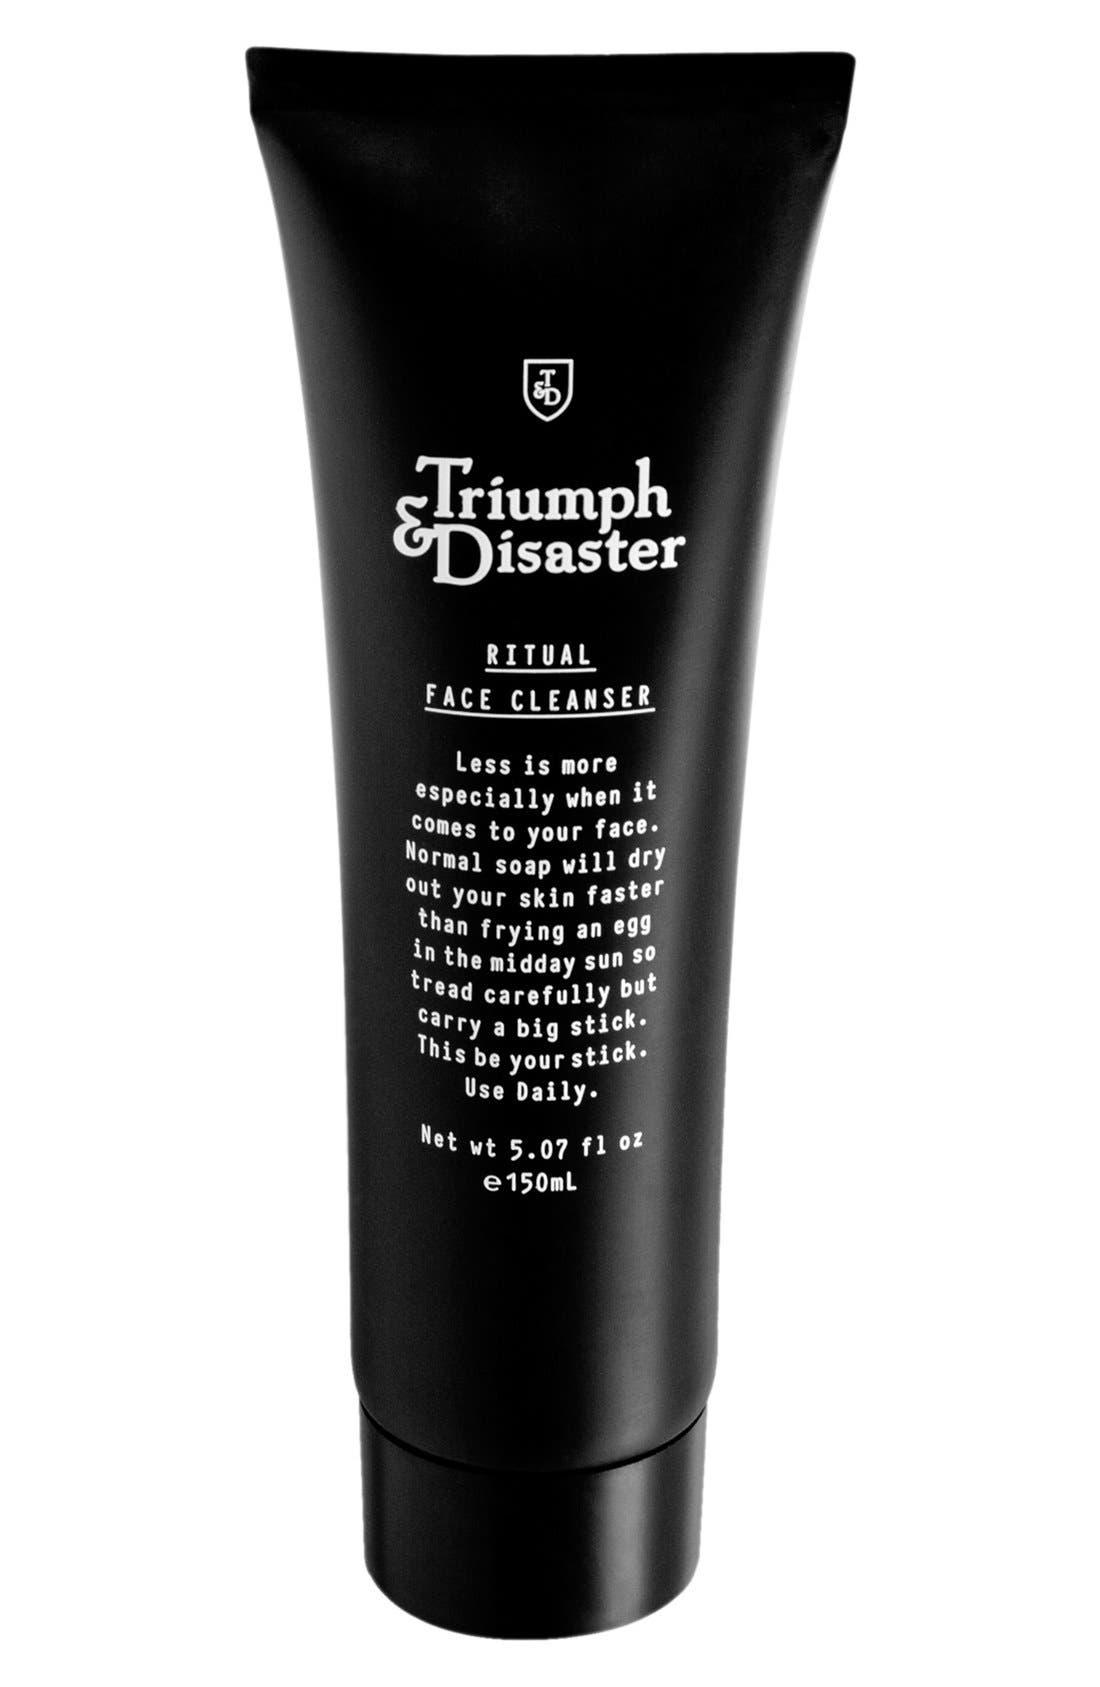 Triumph & Disaster 'Ritual' Face Cleanser